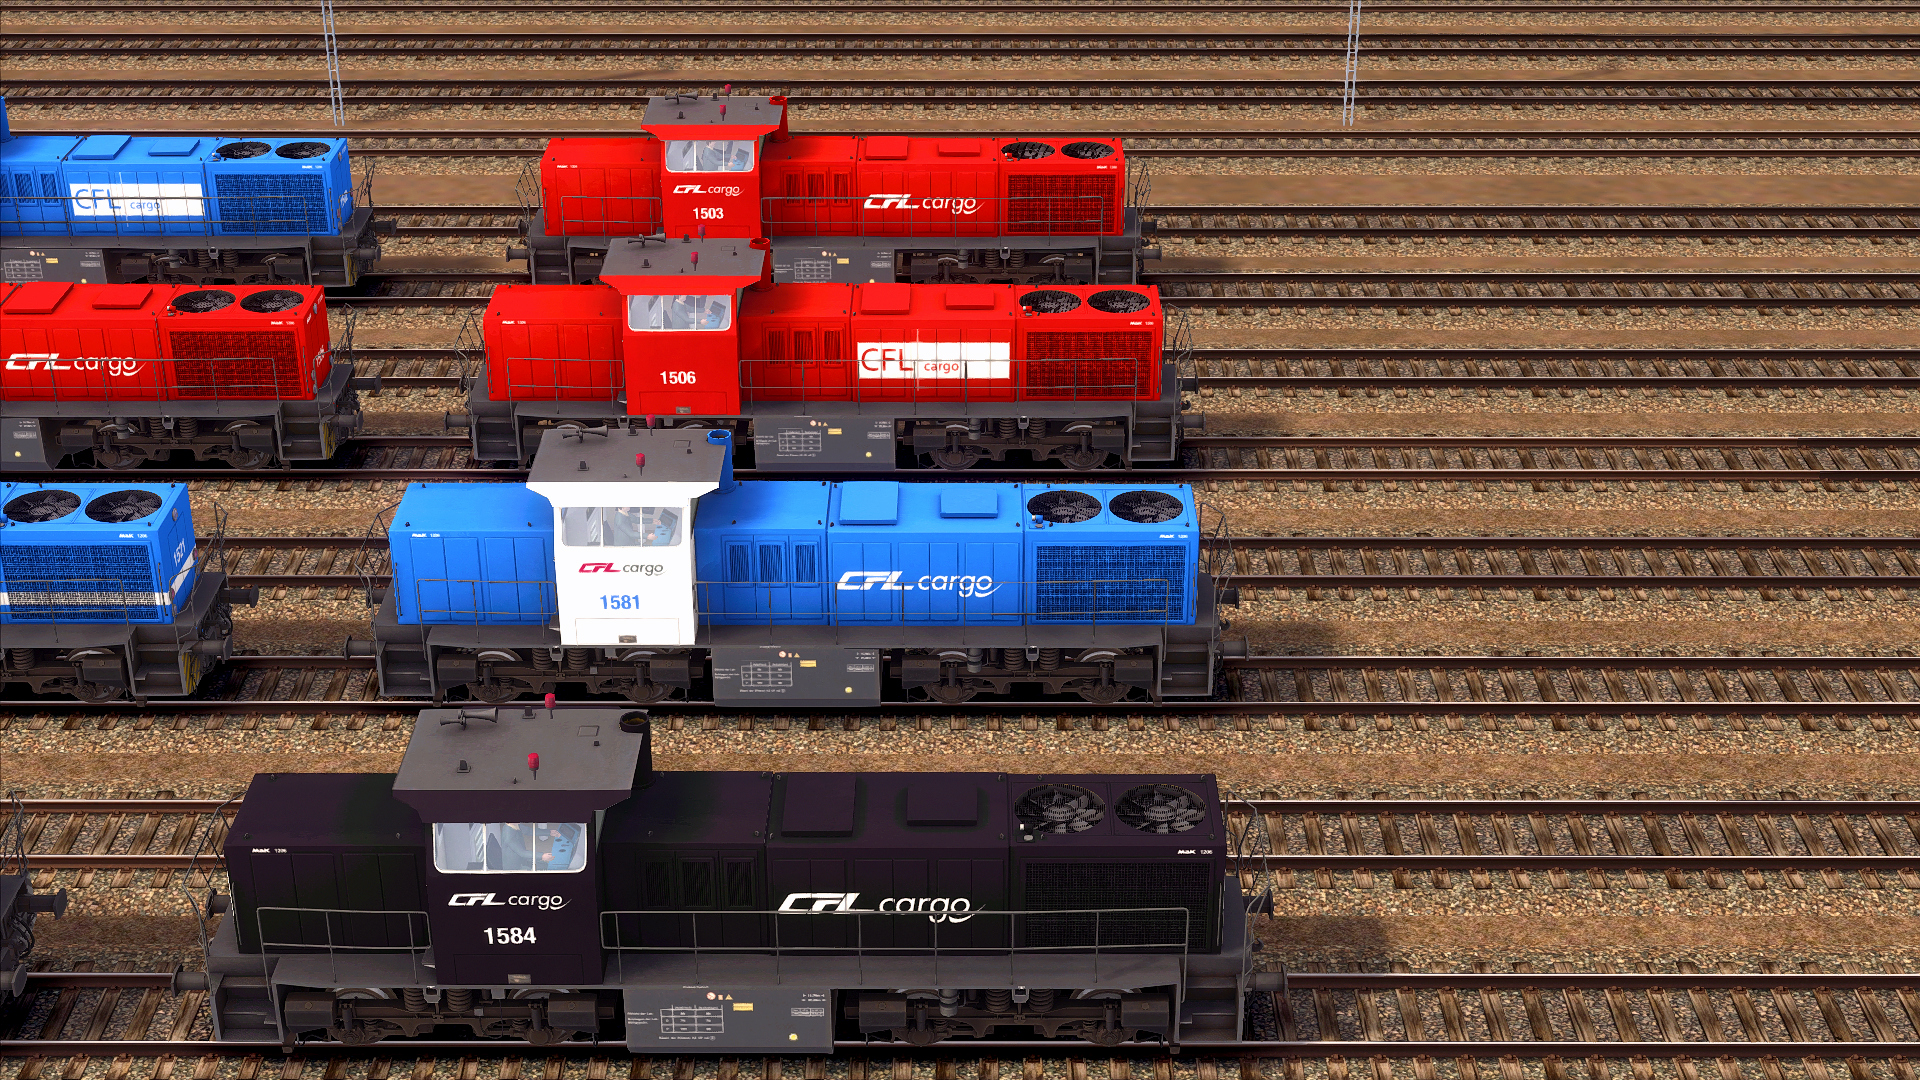 RailWorks64_2021-04-15_00-16-00.jpg